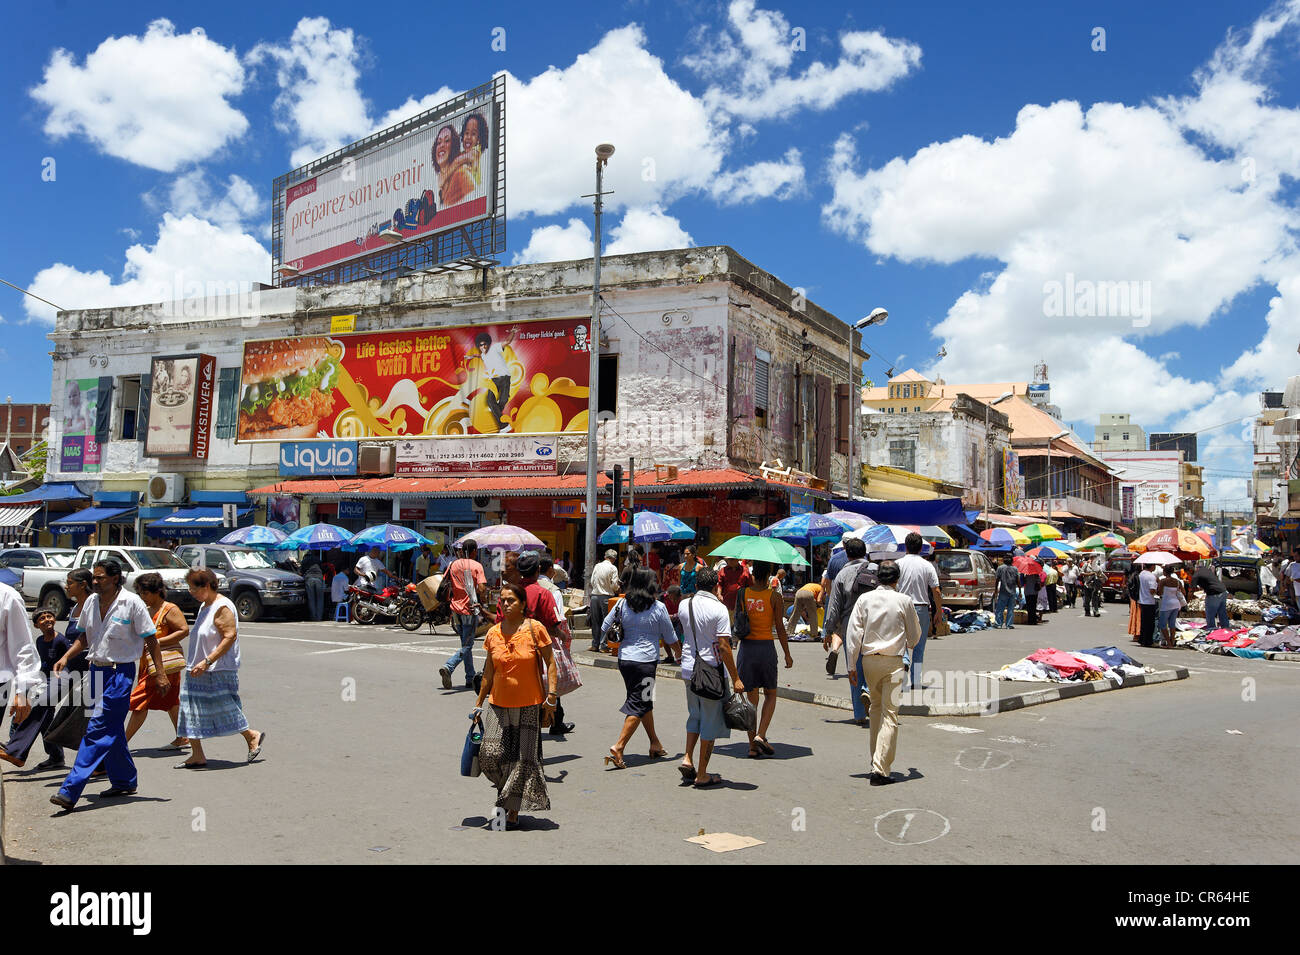 Mauritius, Port Louis District, Port Louis, hustle and bustle pedestrian street around the Central Market Stock Photo